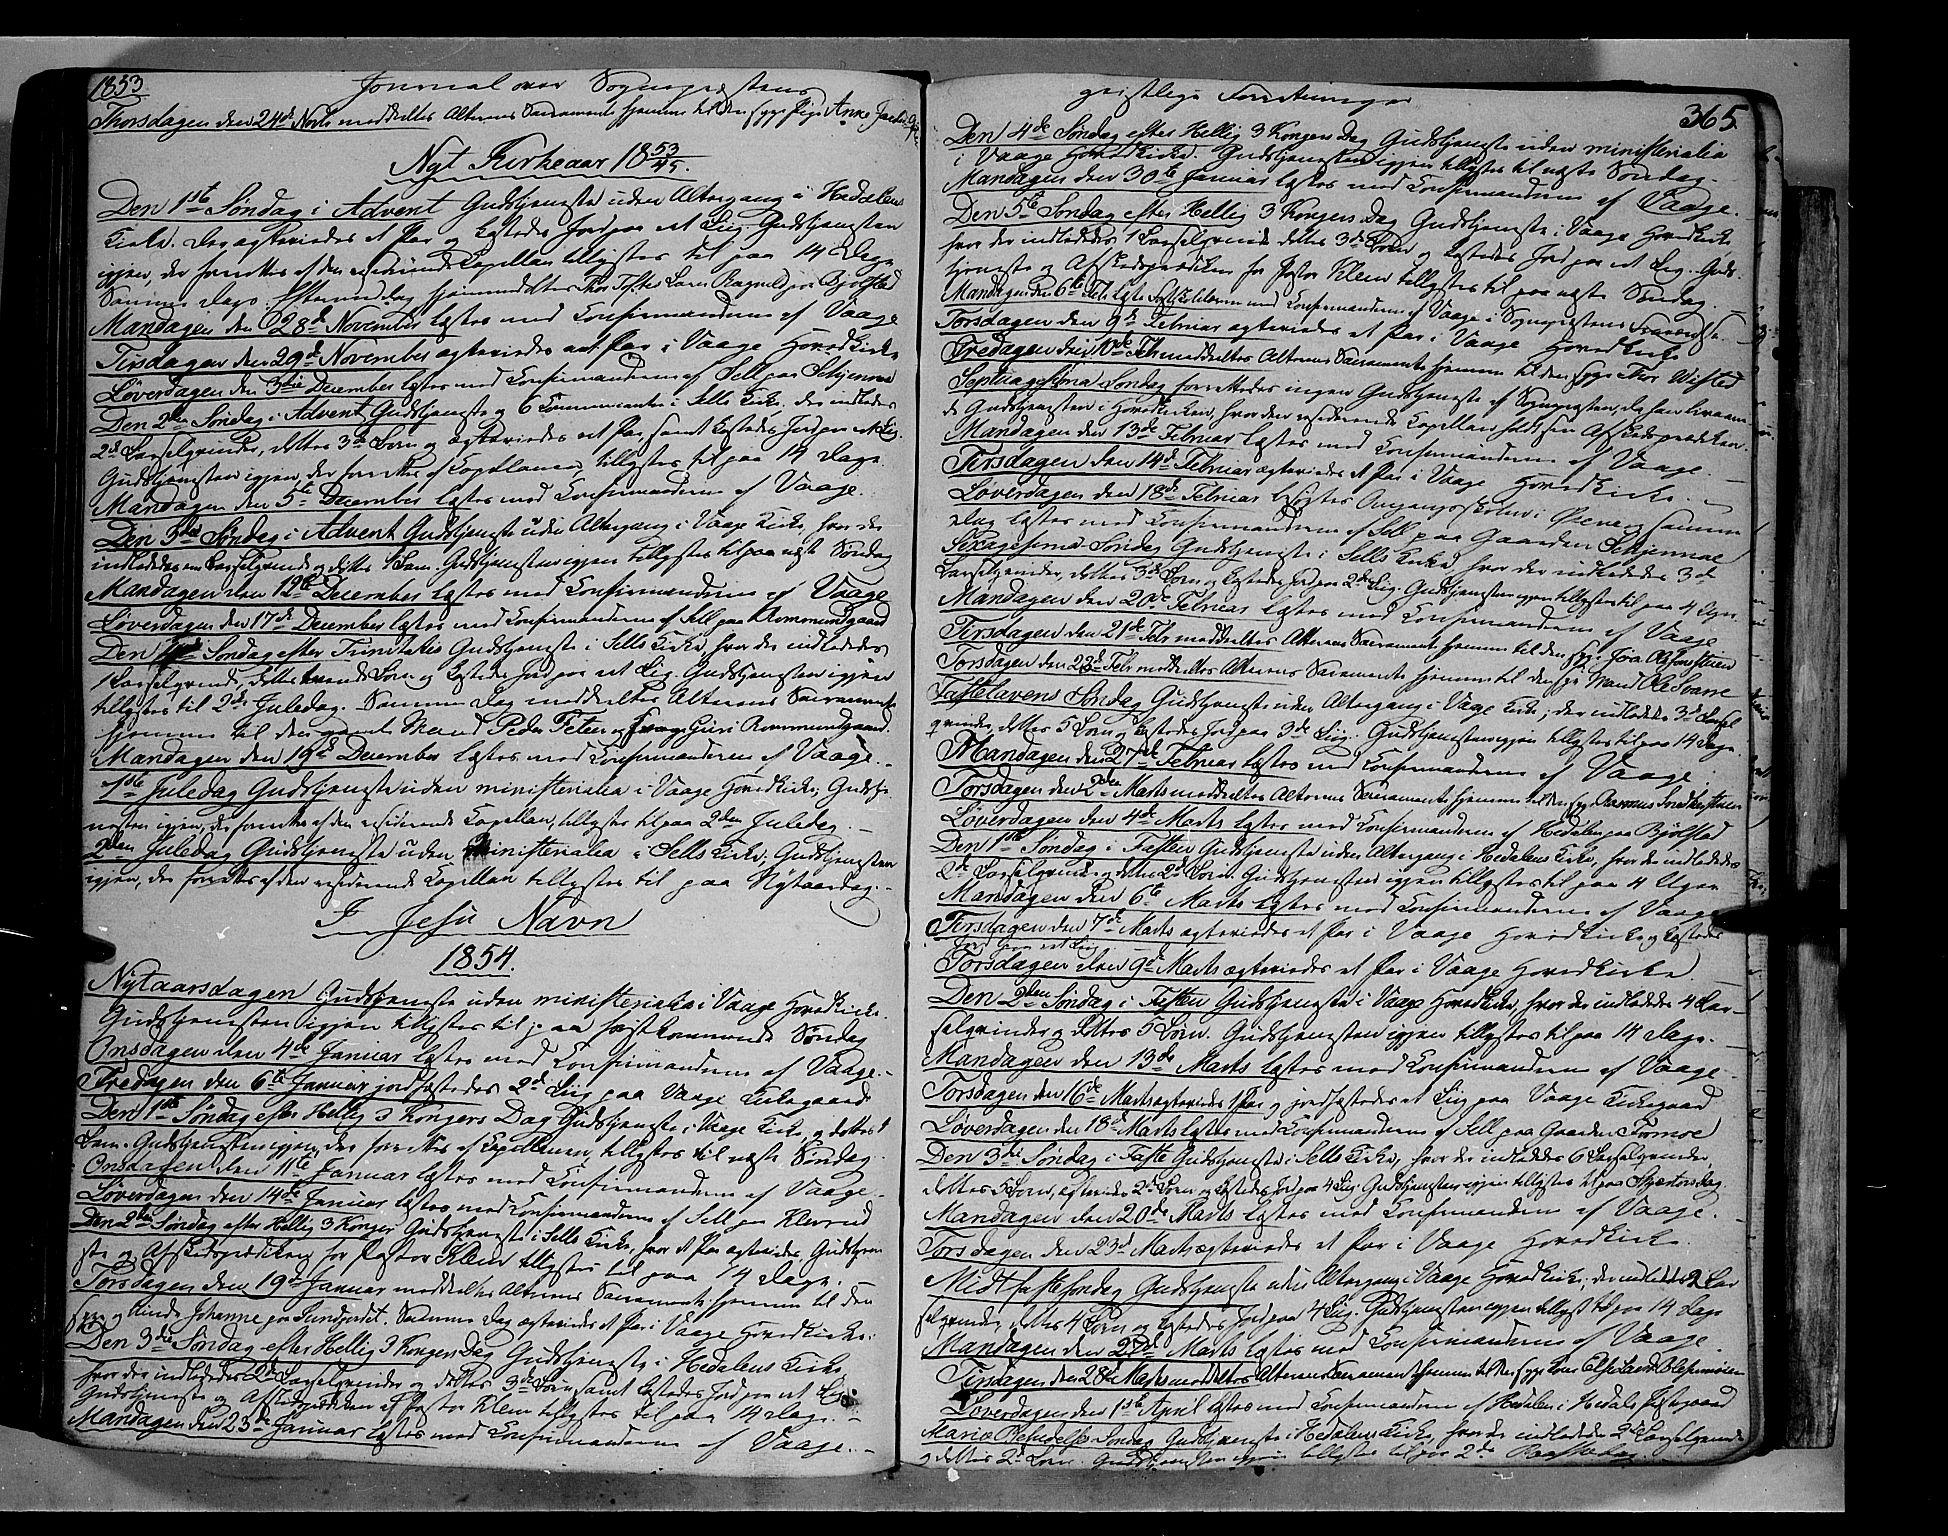 SAH, Vågå prestekontor, Ministerialbok nr. 5 /1, 1842-1856, s. 365